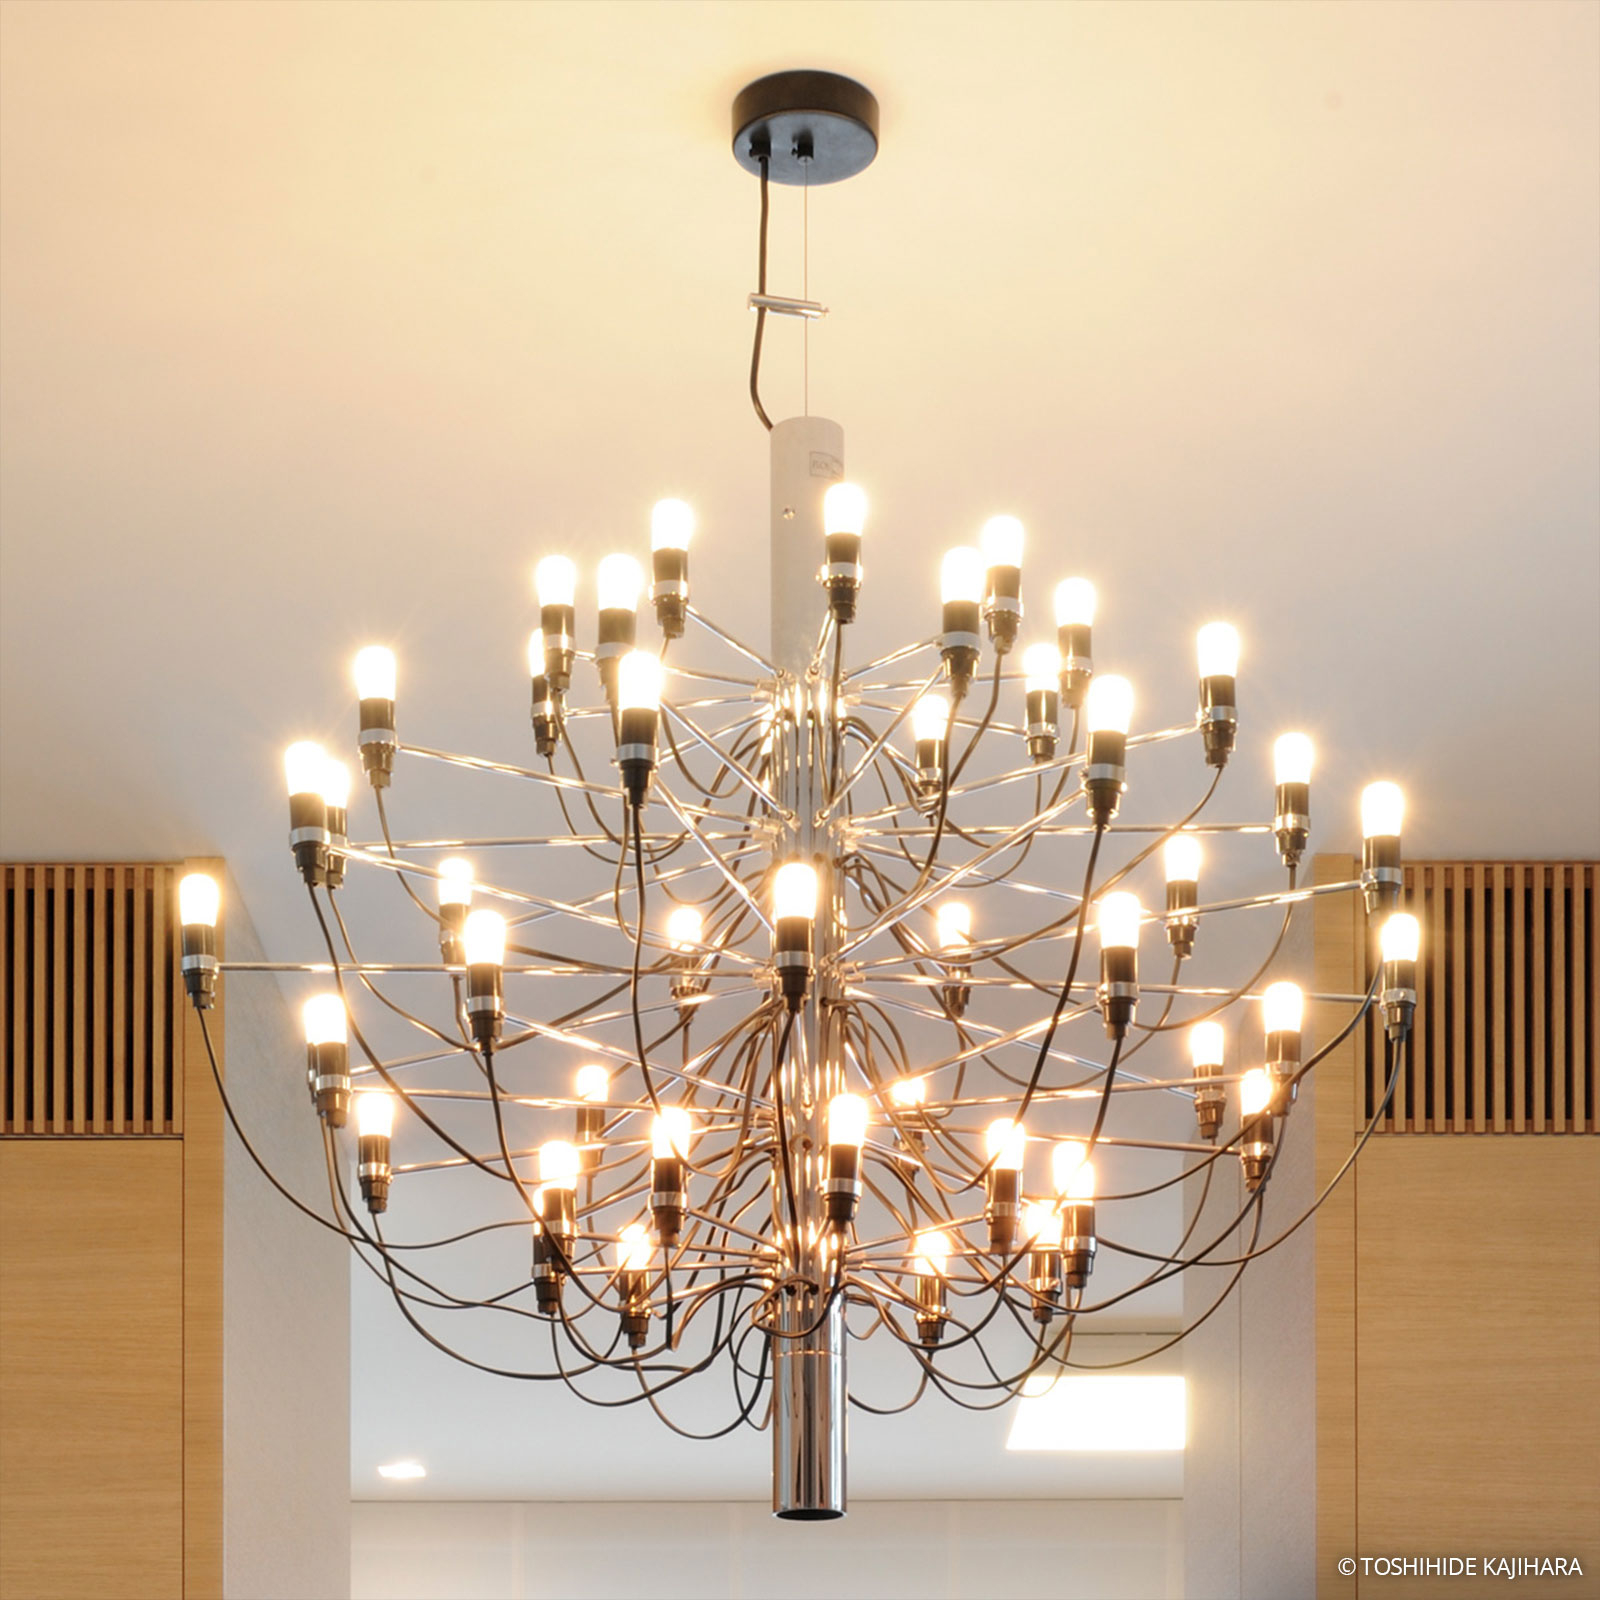 FLOS 2097/30 Kroonluchter 30-lamps chroom, frosted